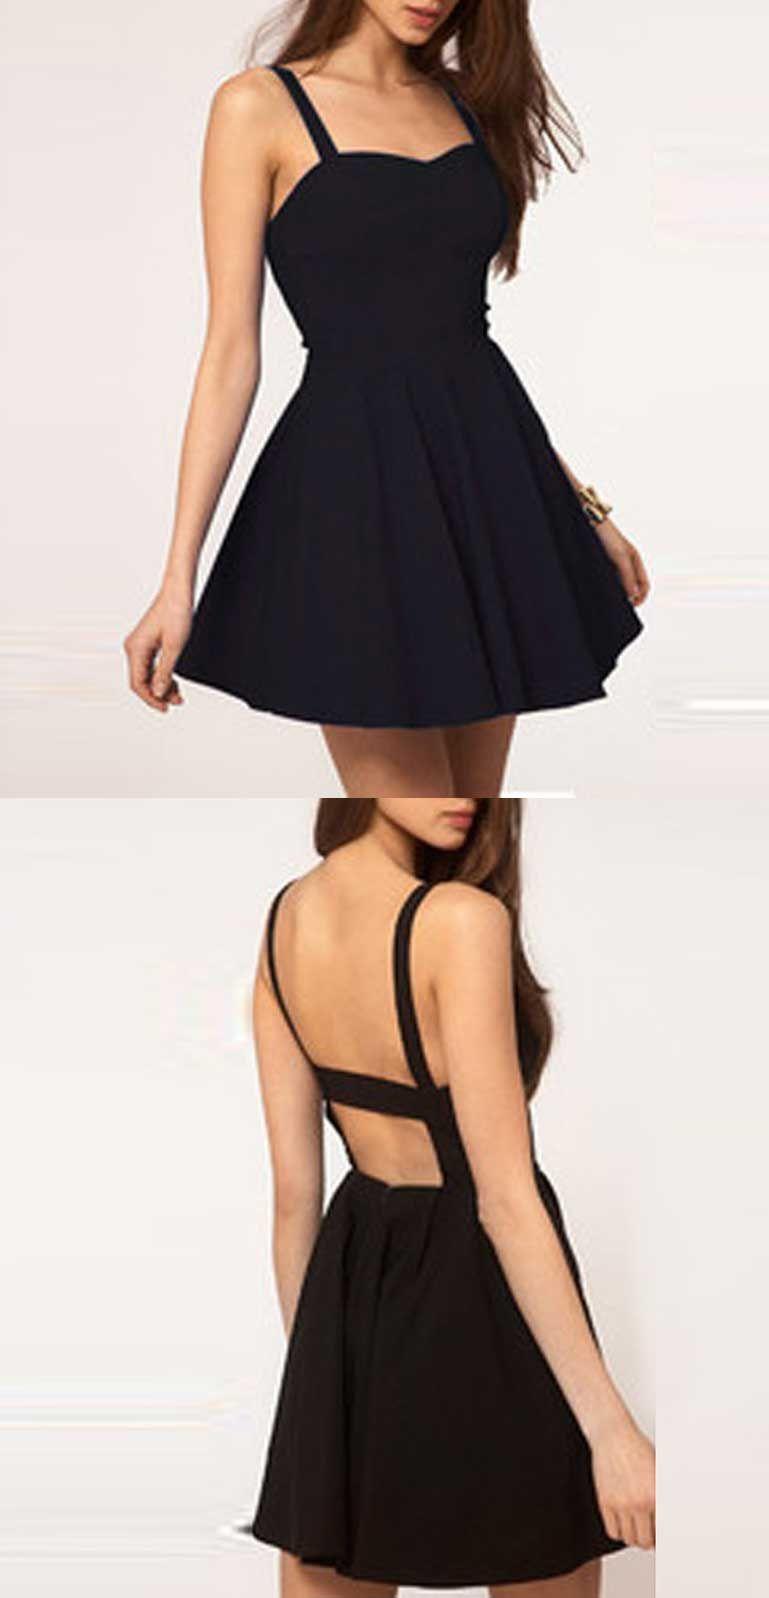 Cute Sweetheart Homecoming Dresses,satin homecoming dress,short ...